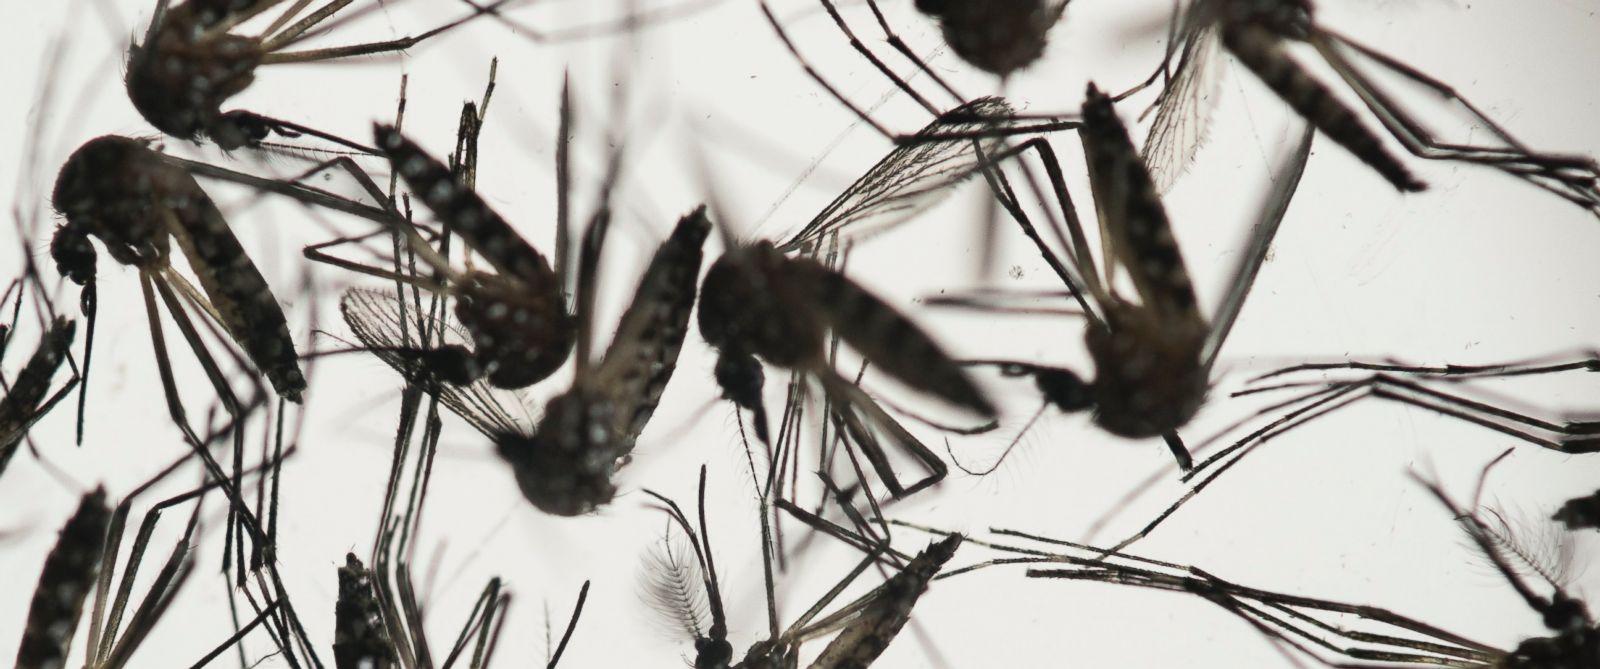 PHOTO: Aedes aegypti mosquitoes sit in a petri dish at the Fiocruz institute in Recife, Pernambuco state, Brazil, Jan. 27, 2016.